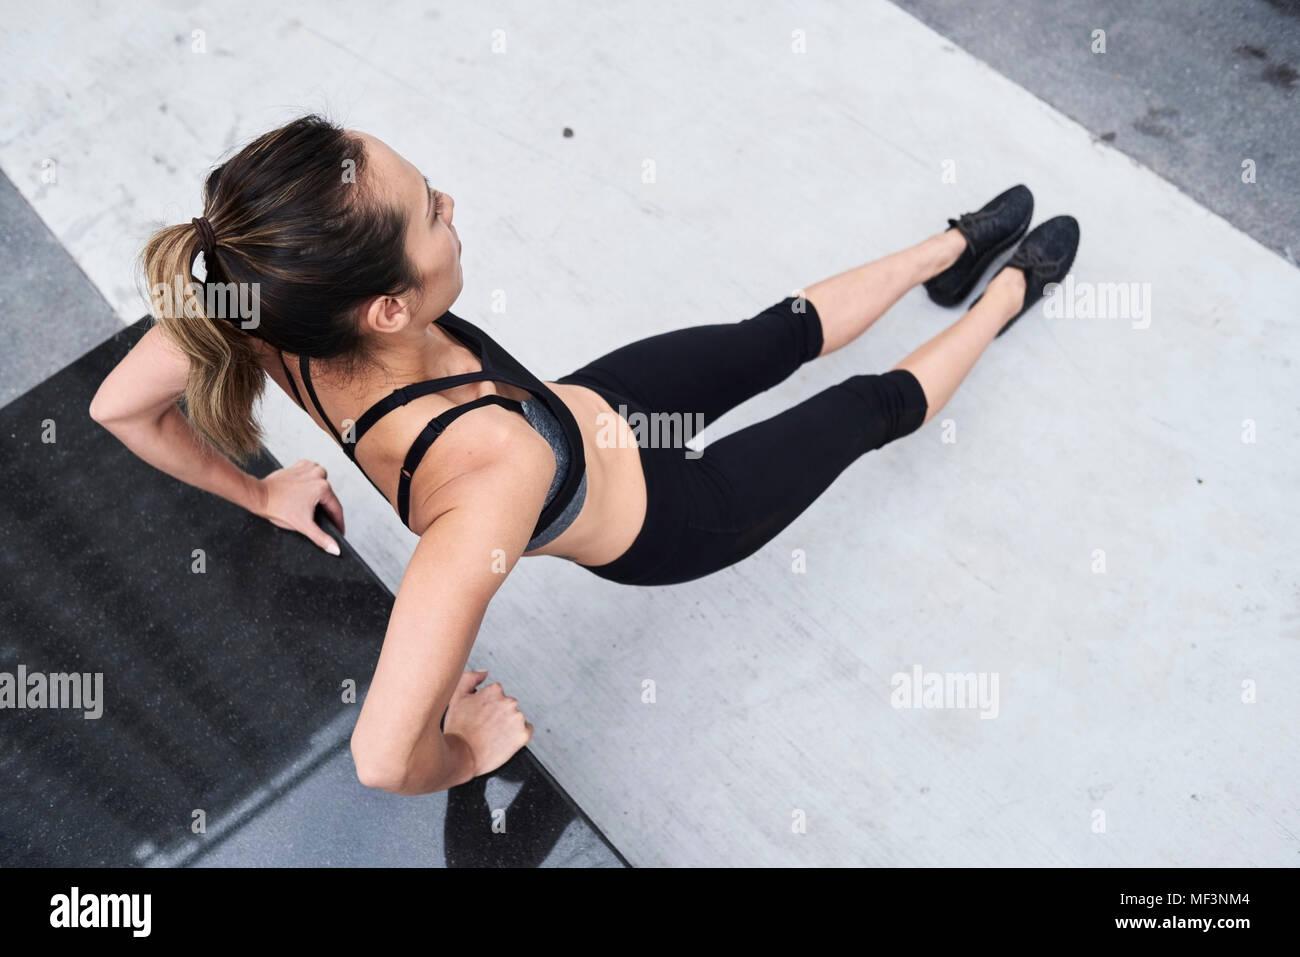 Passende Frau tun Push-ups im Freien Stockbild